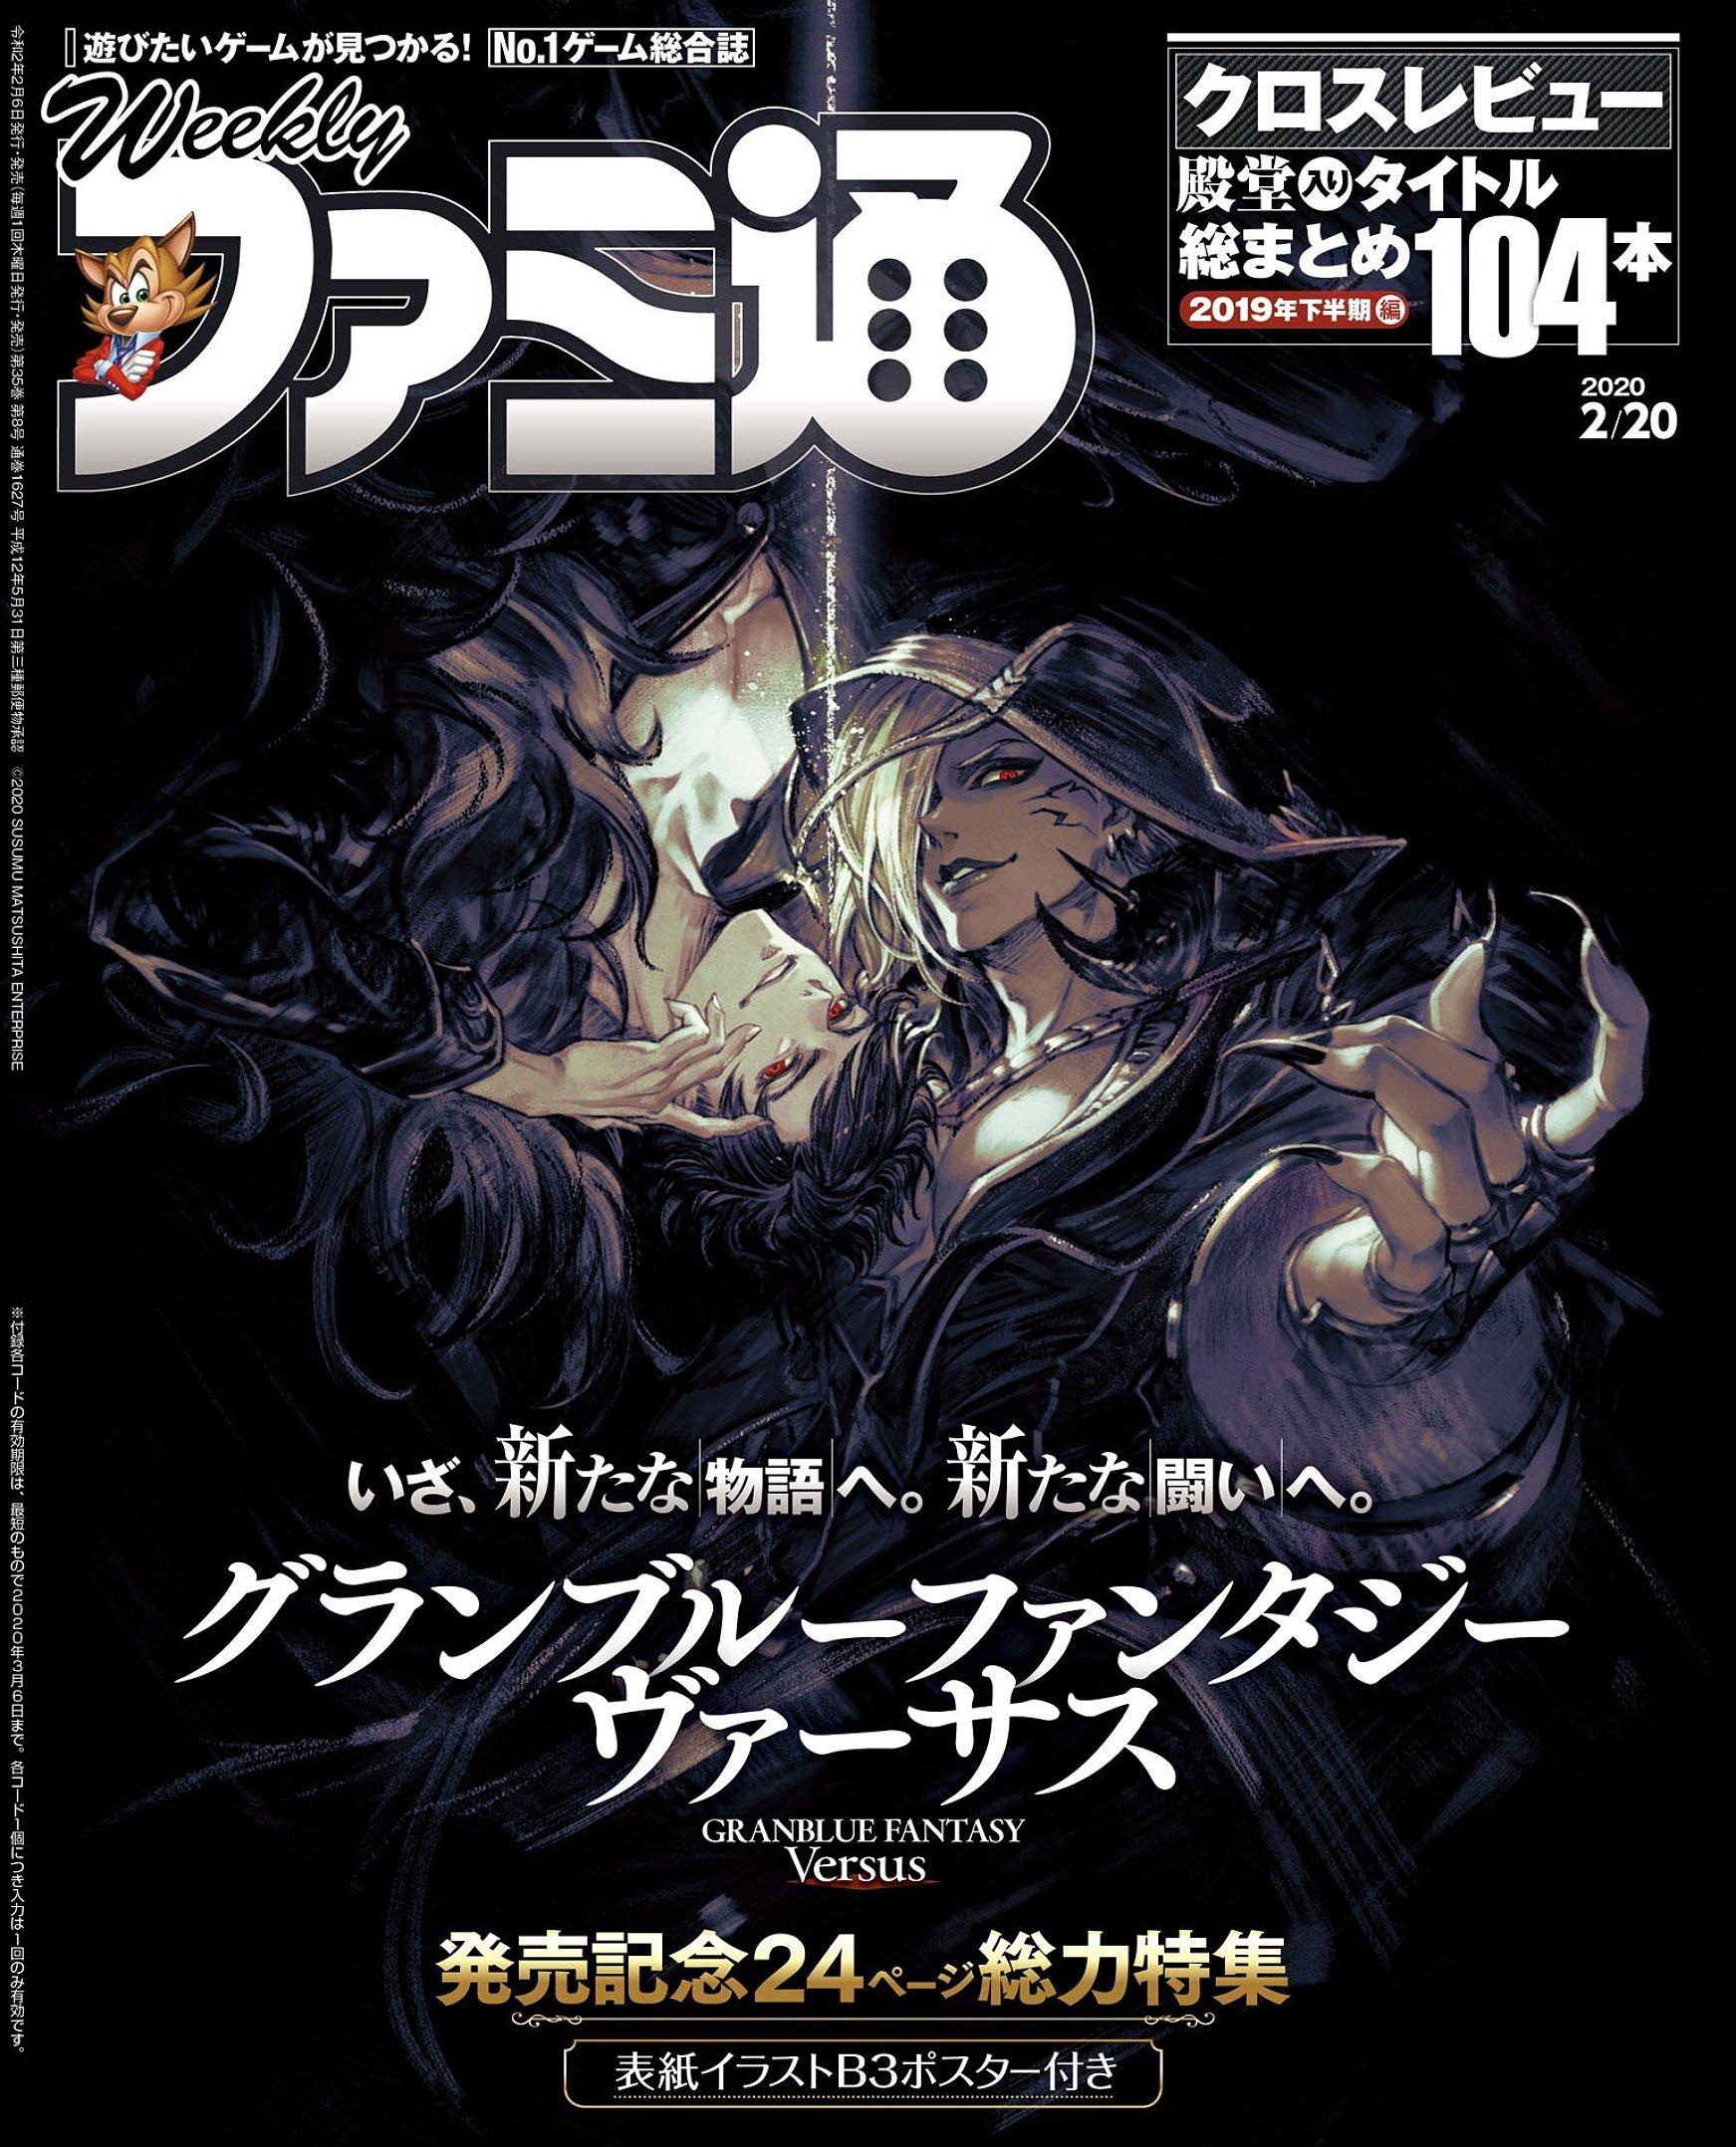 Famitsu 1627 (February 20, 2020)